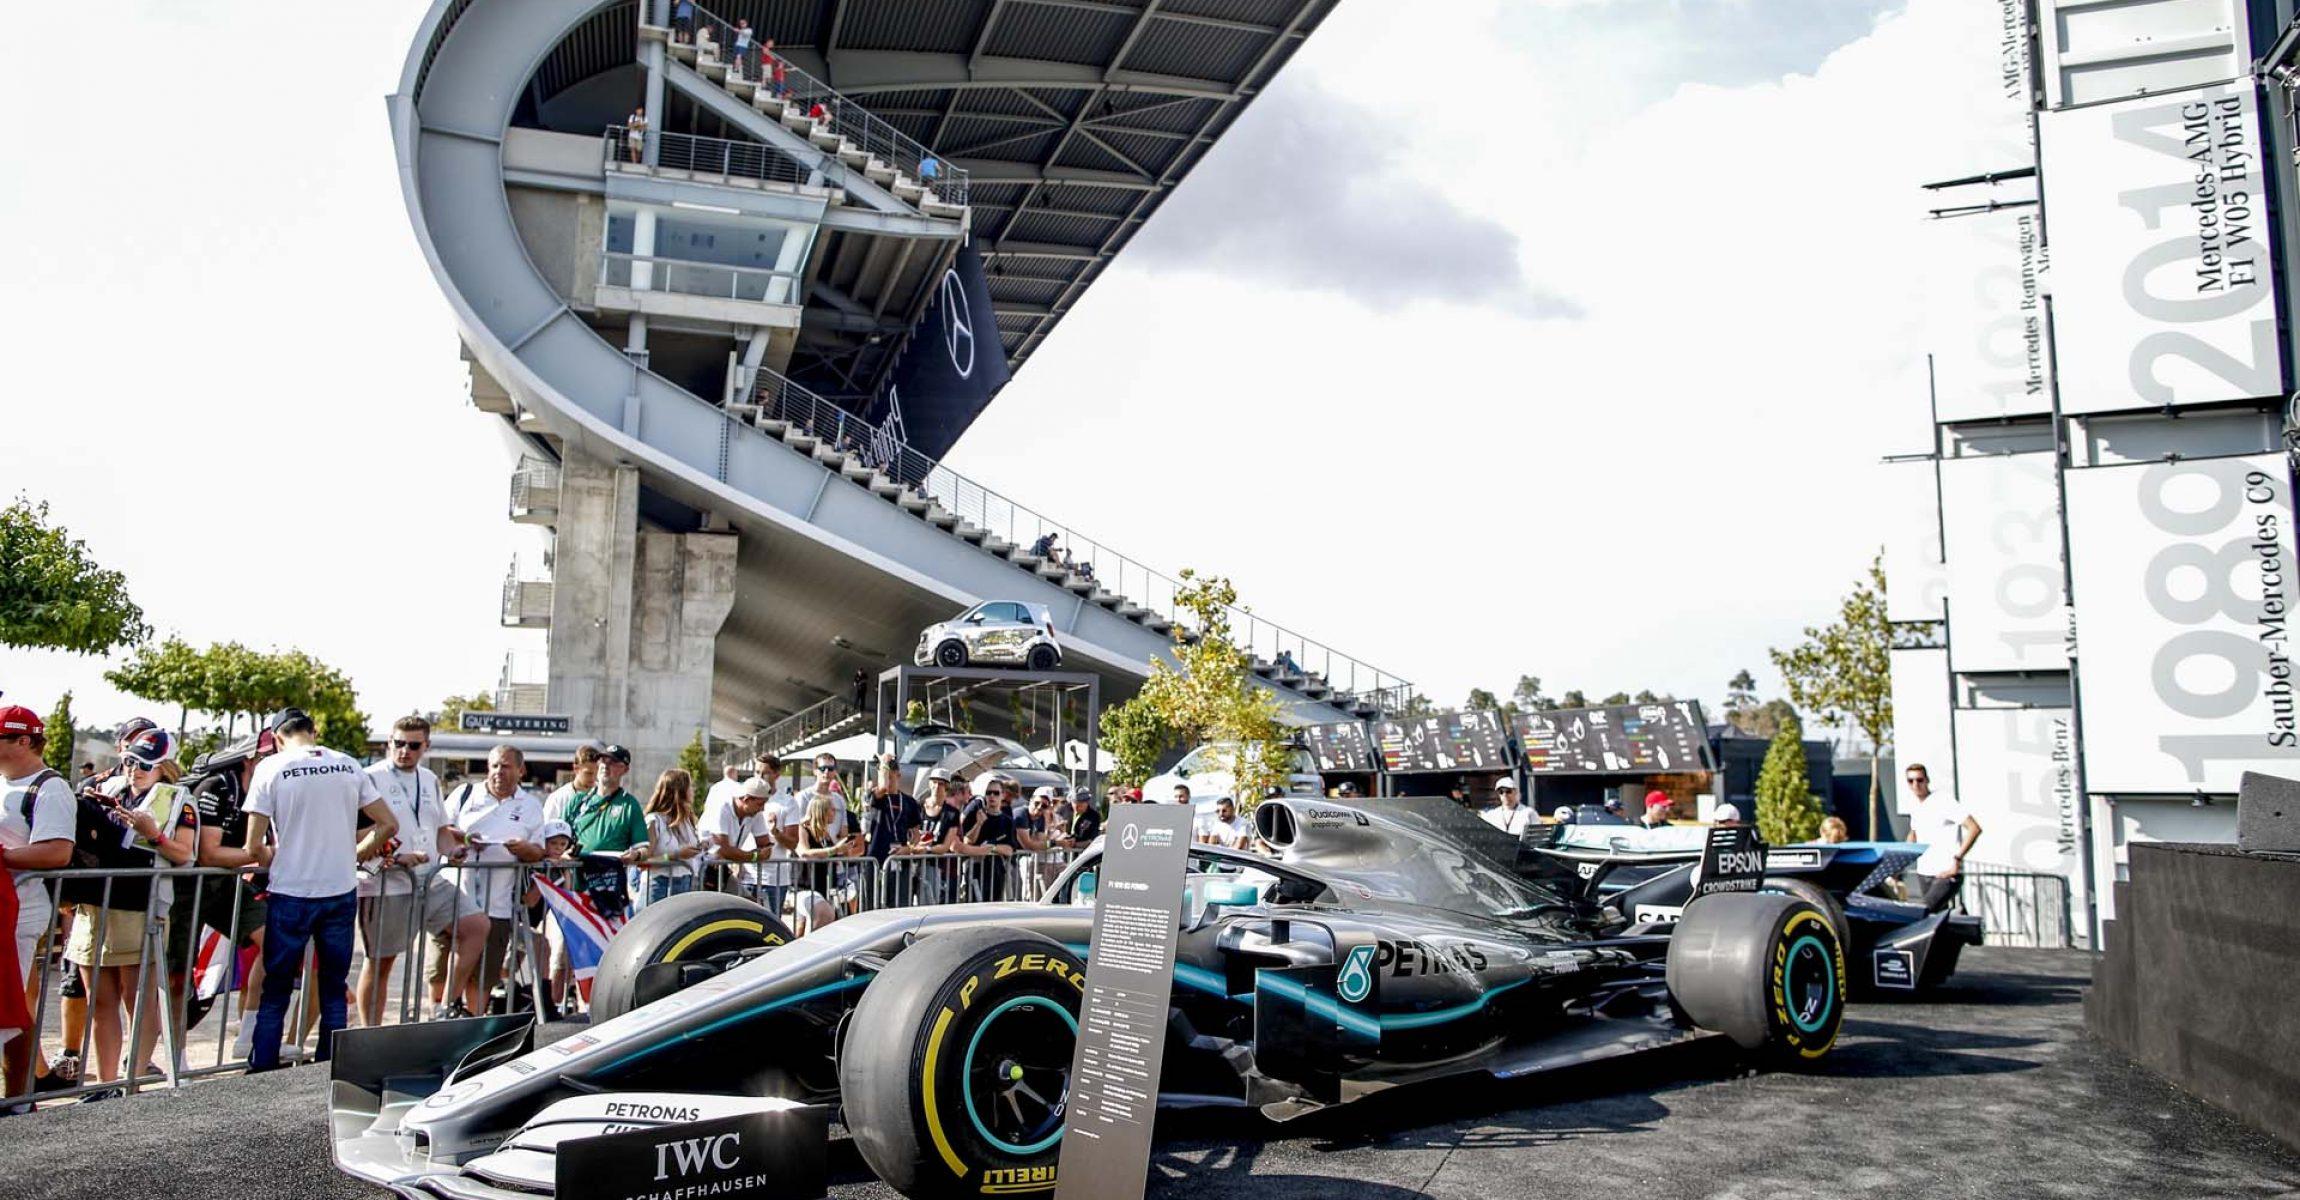 2019 German Grand Prix, Sunday - Wolfgang Wilhelm